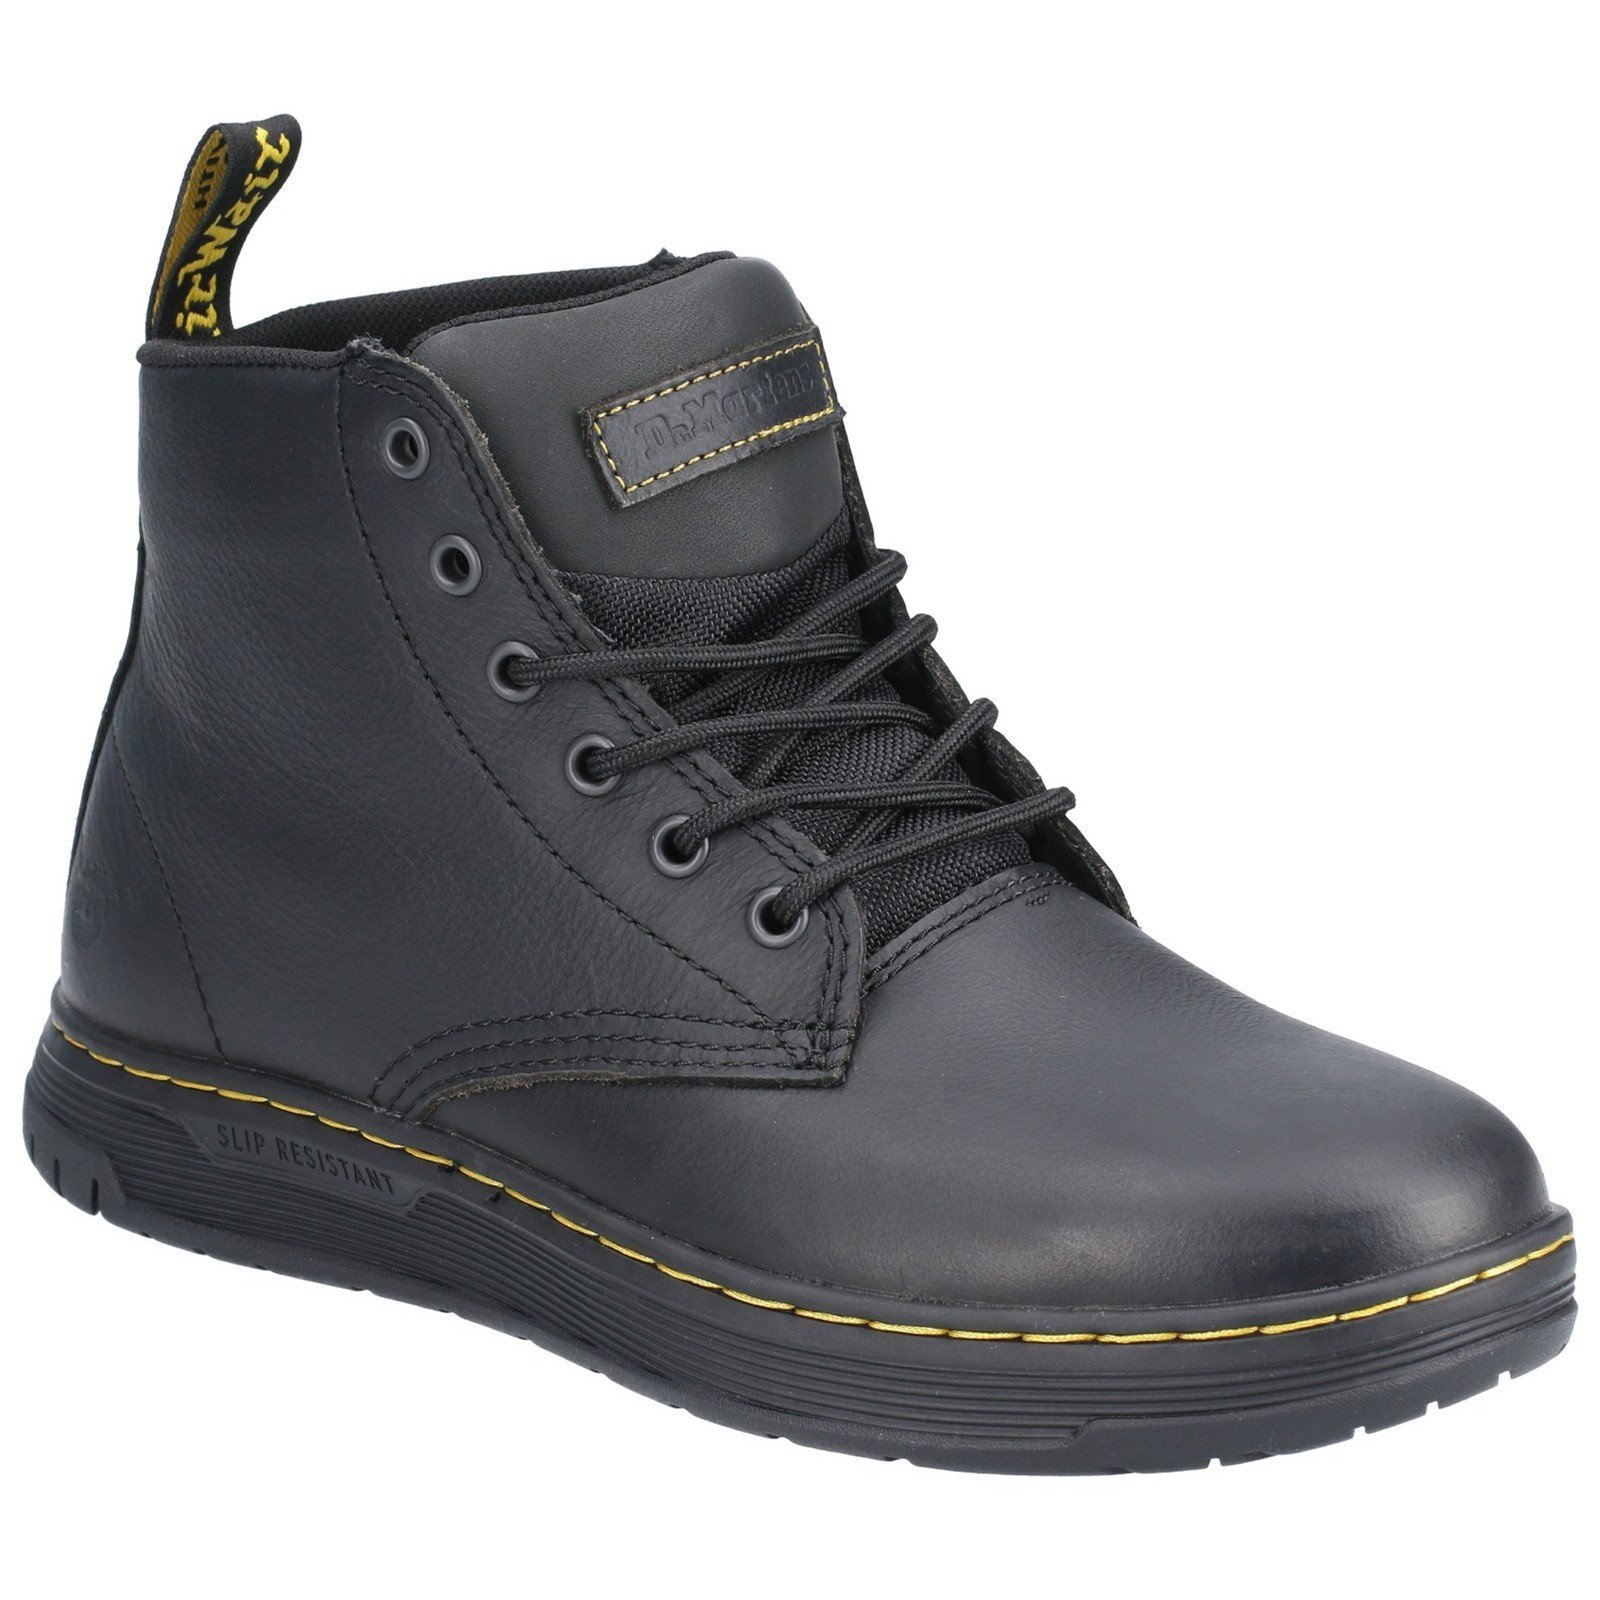 Dr Martens Men's Amwell Slip Resistant Leather Boot Black 29508 - Black 13